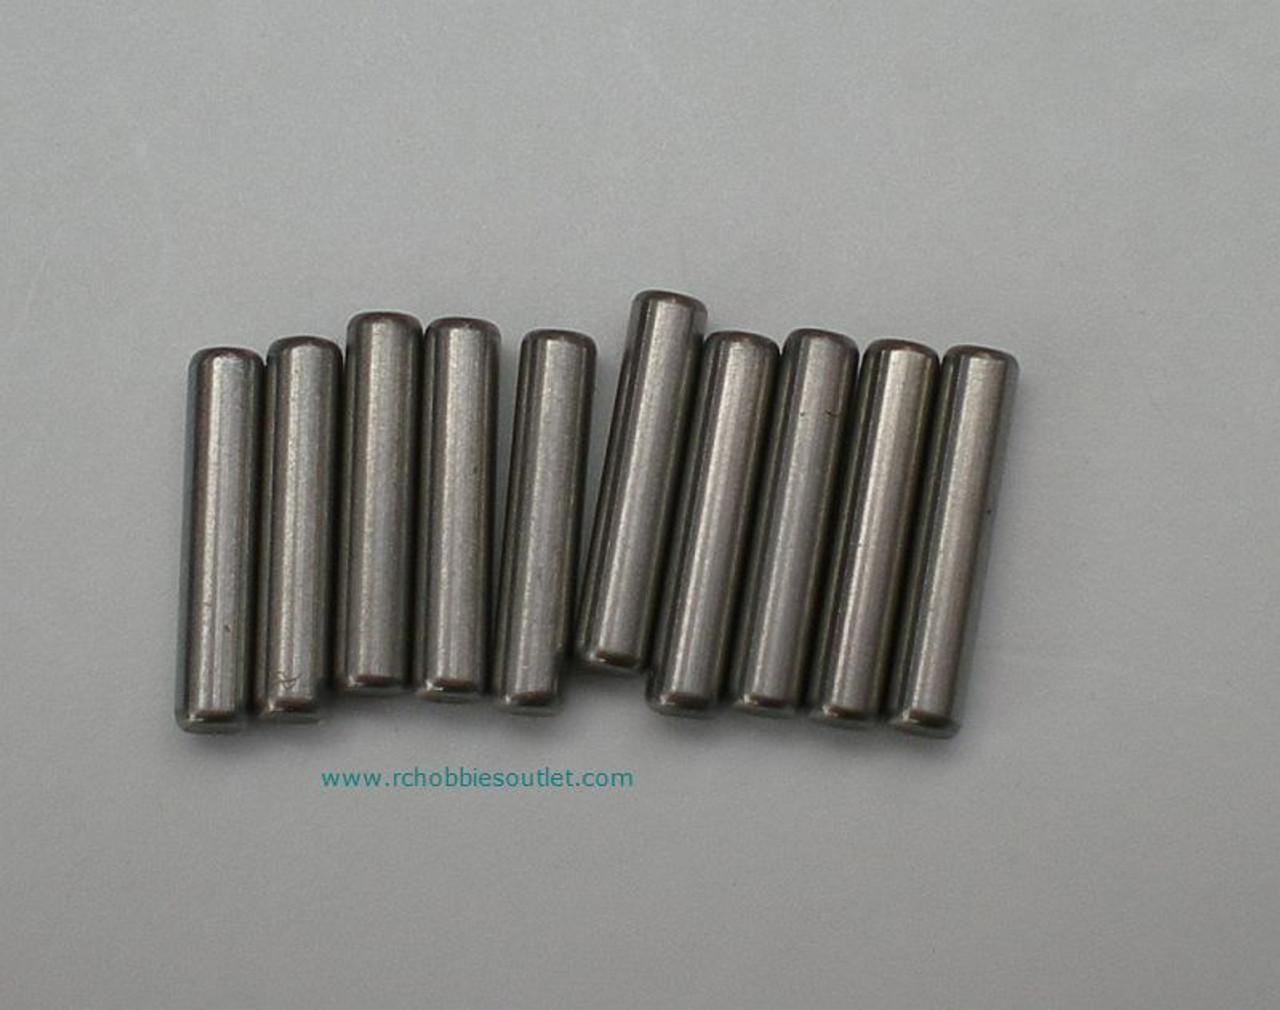 08027 Pins 2x10 10p HSP Redcat  HIMOTO ETC